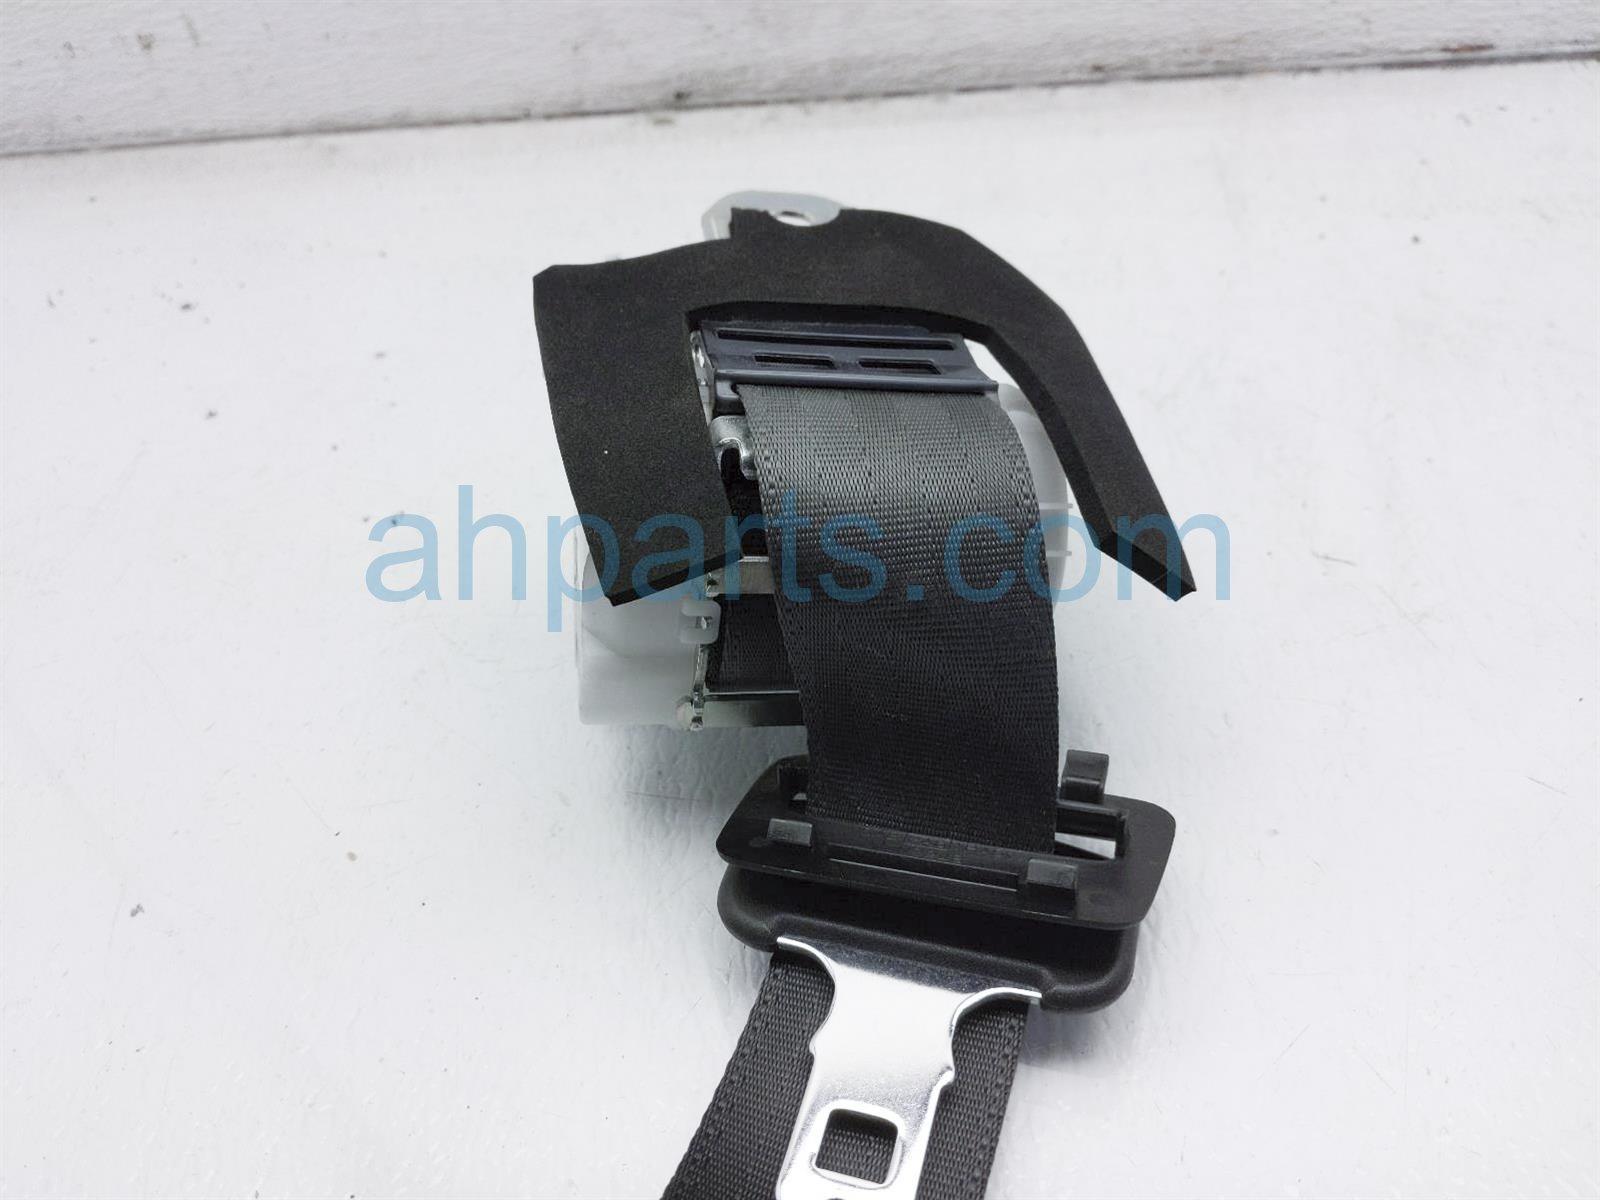 2011 Infiniti G37 Rear 2nd Row Mid Seat Belt   Black 88854 JK70B Replacement